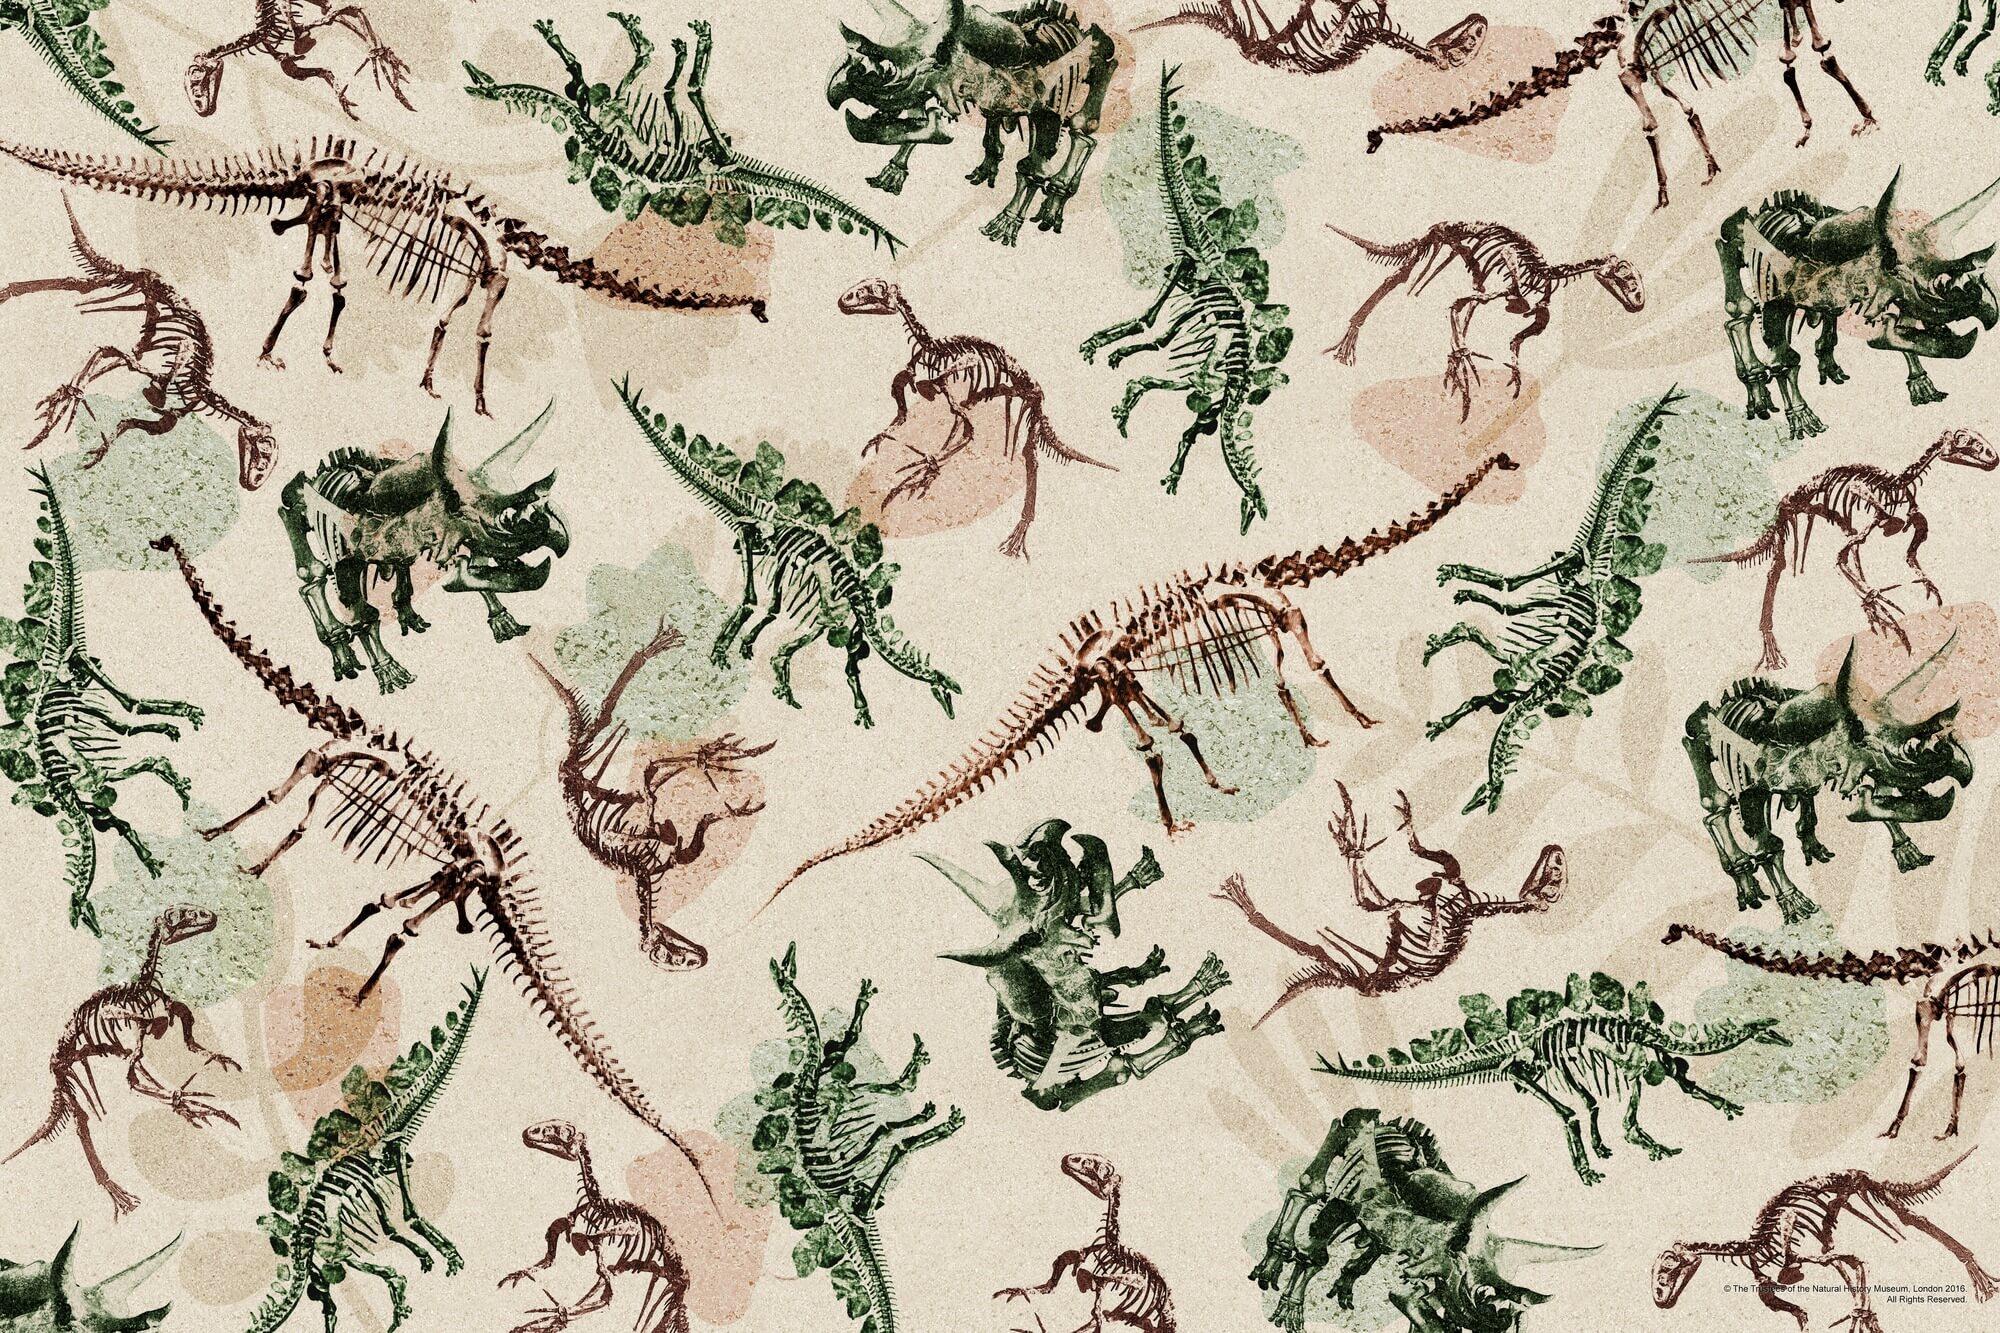 Dinosaur Skeleton Montage wallpaper mural